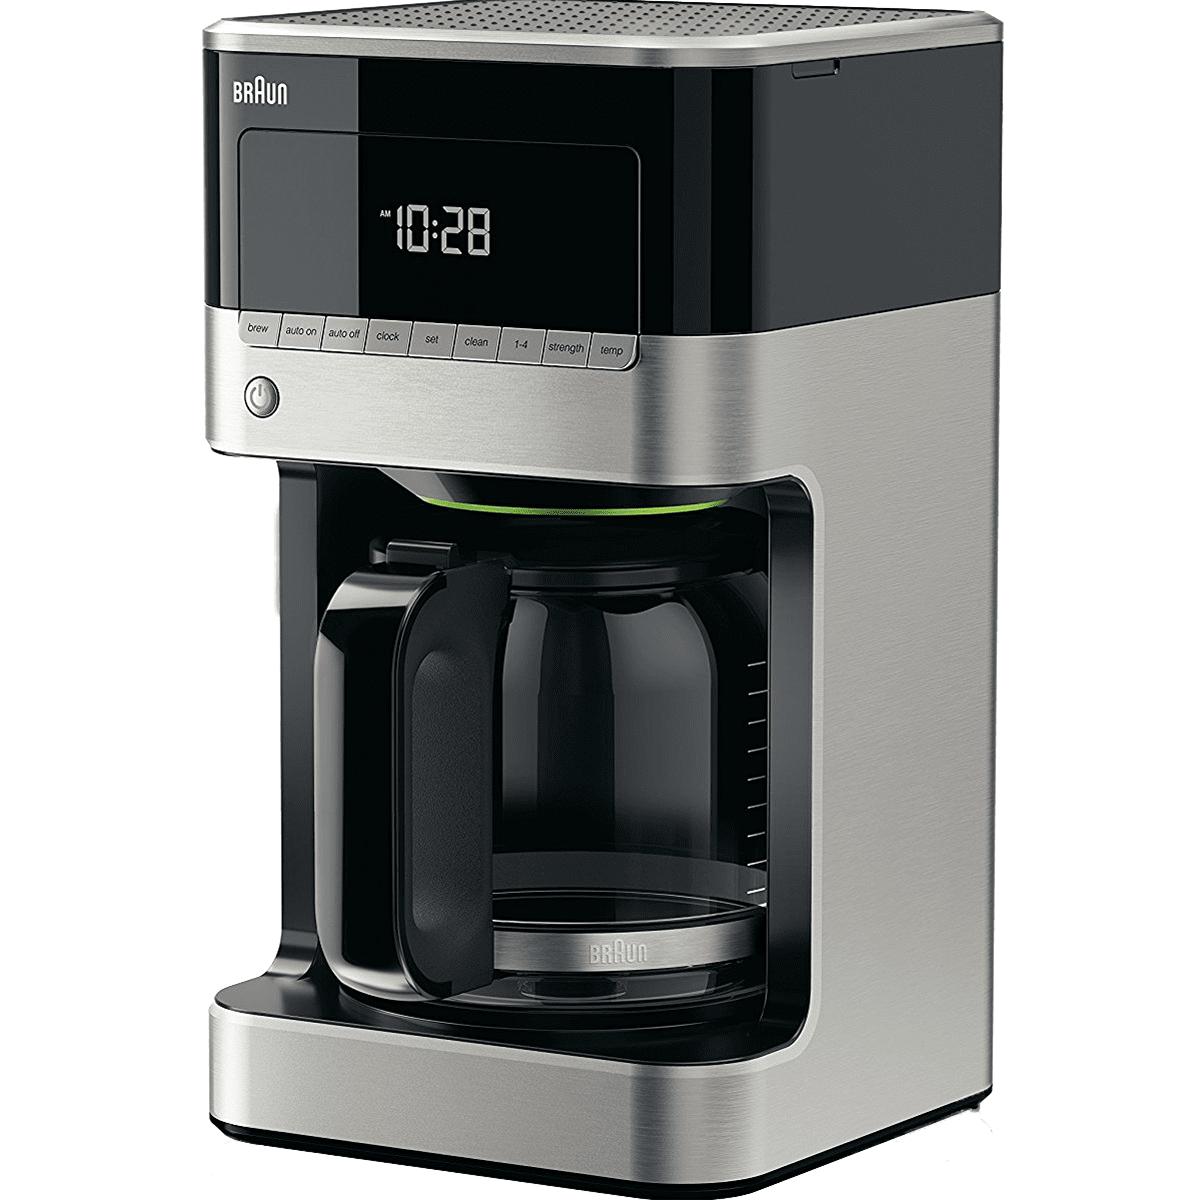 Braun BrewSense 12-Cup Drip Coffee Maker - Stainless (KF7150BK)